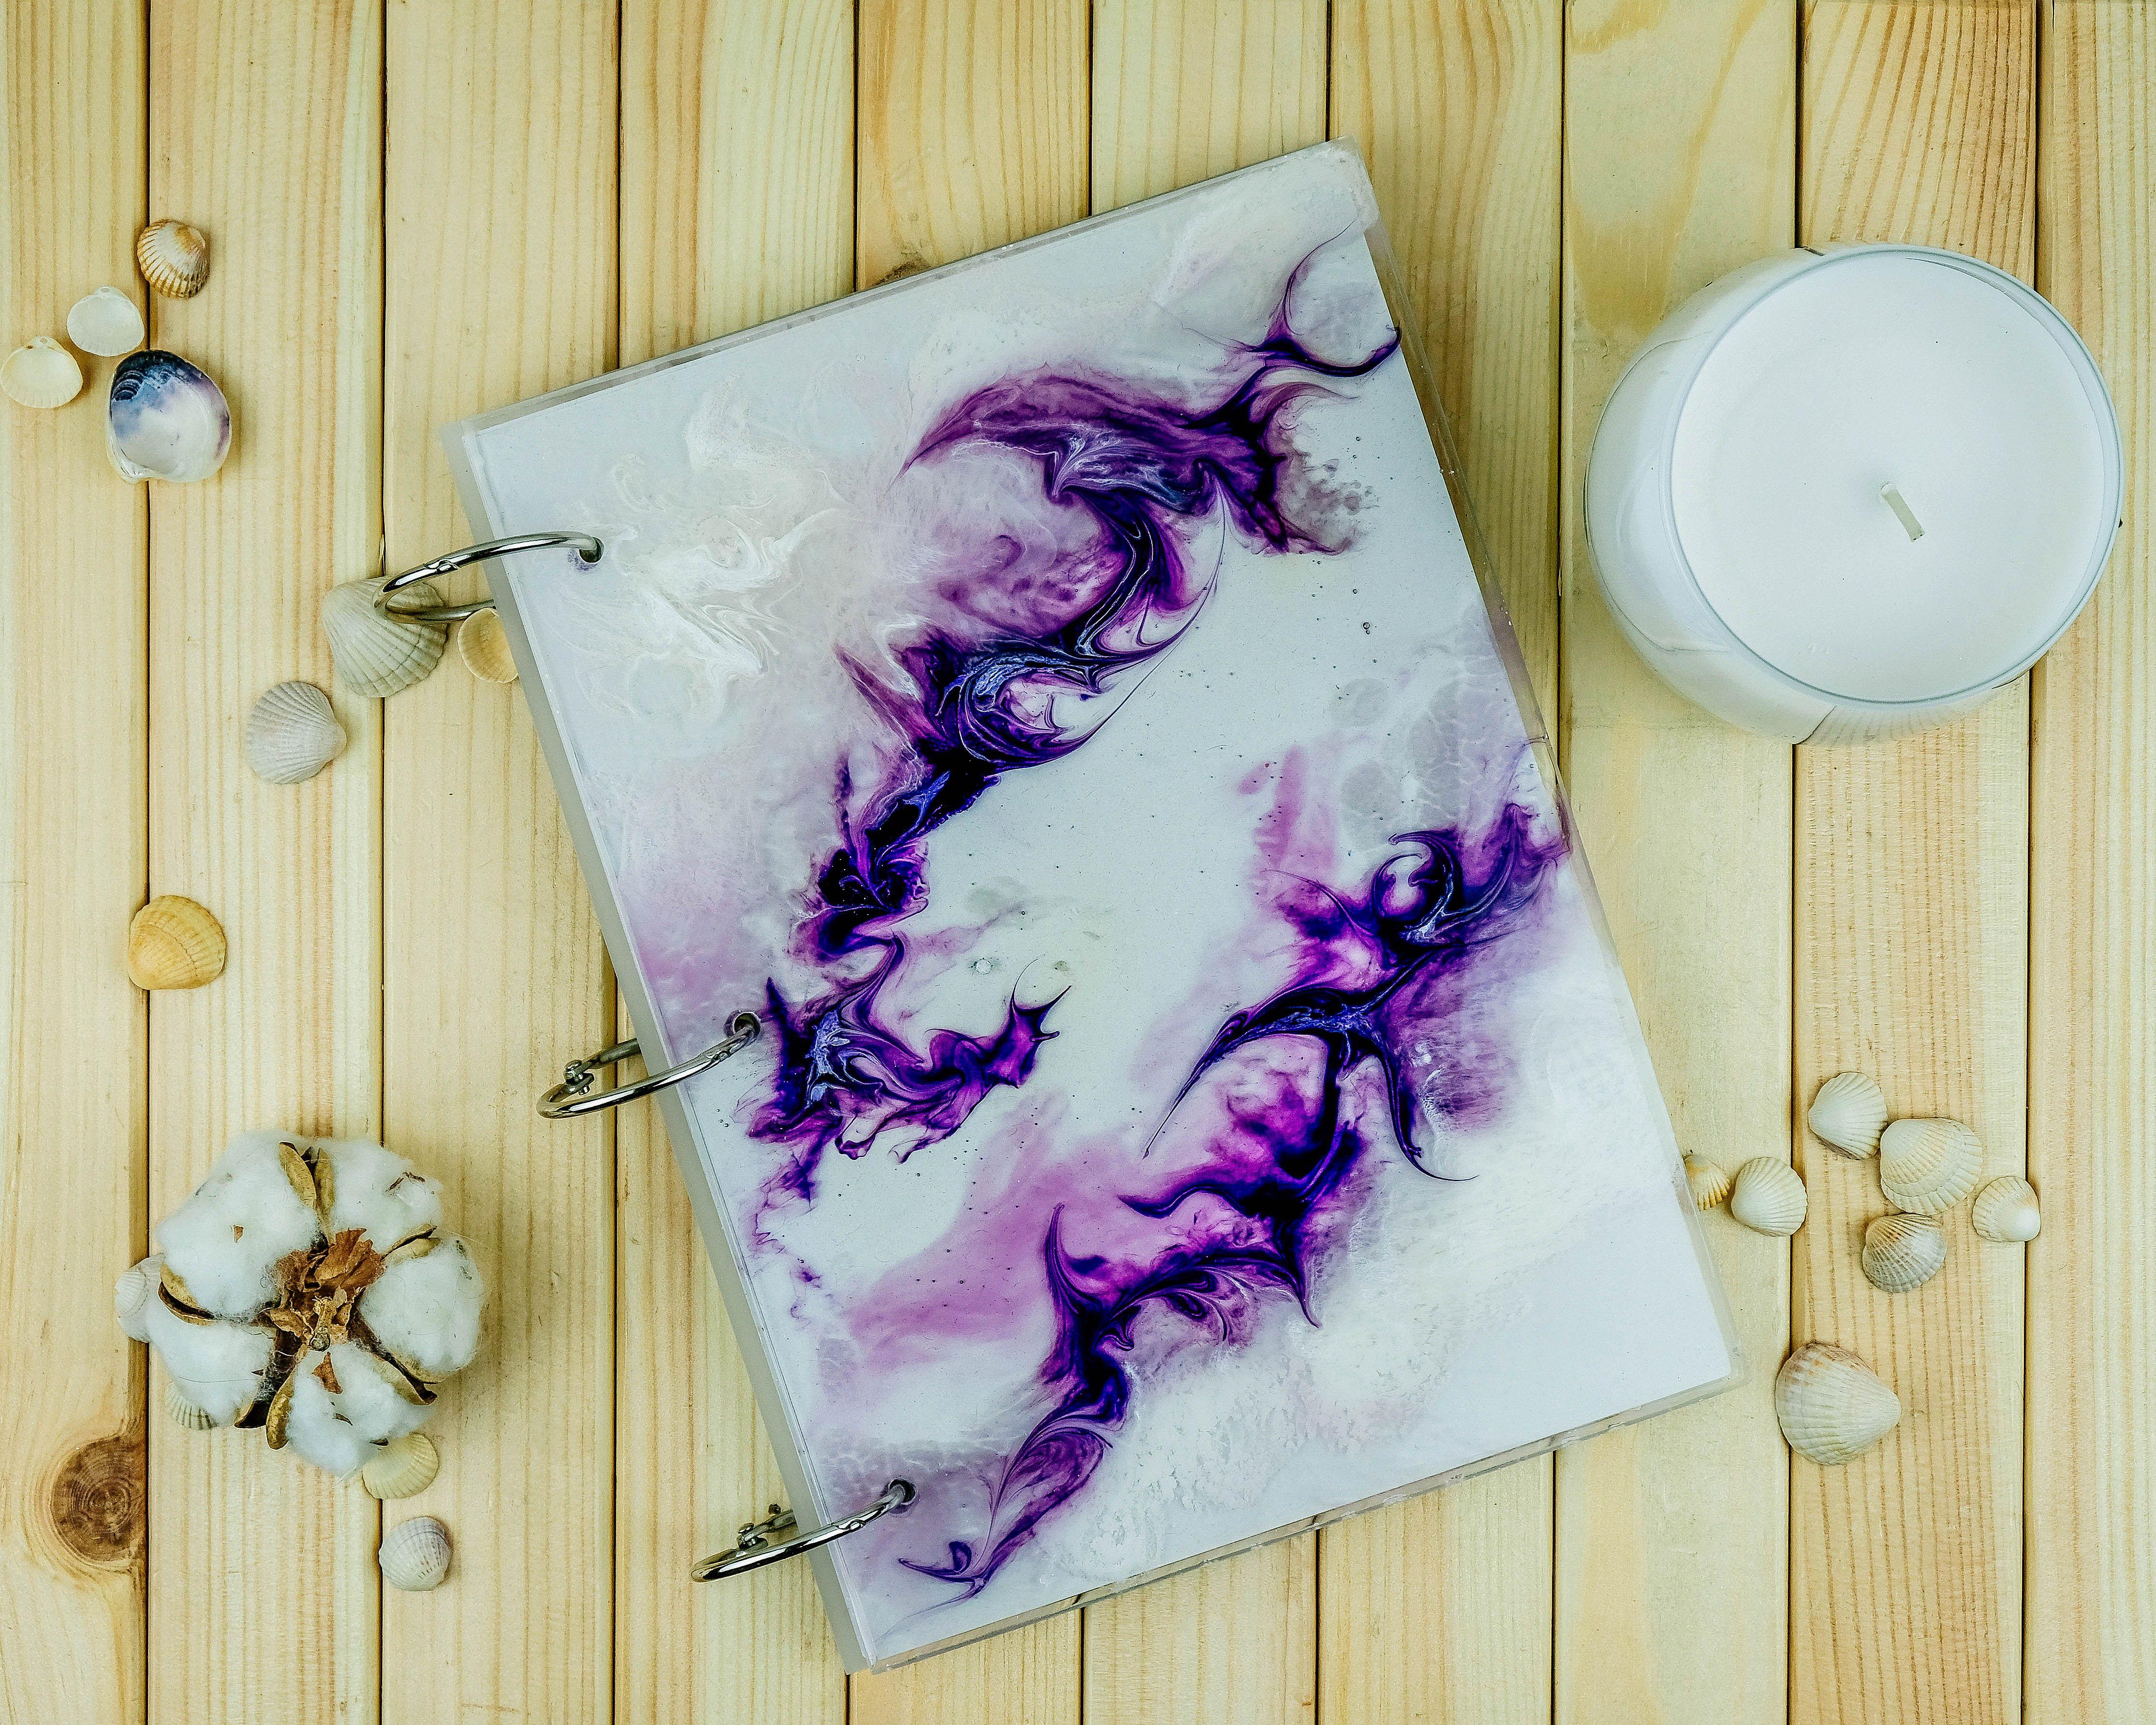 Resin Art Notebook Sketchbook Hand Made Wedding To Order Www Instagram Com Makewaves Art Diy Resin Art Resin Crafts Epoxy Resin Crafts